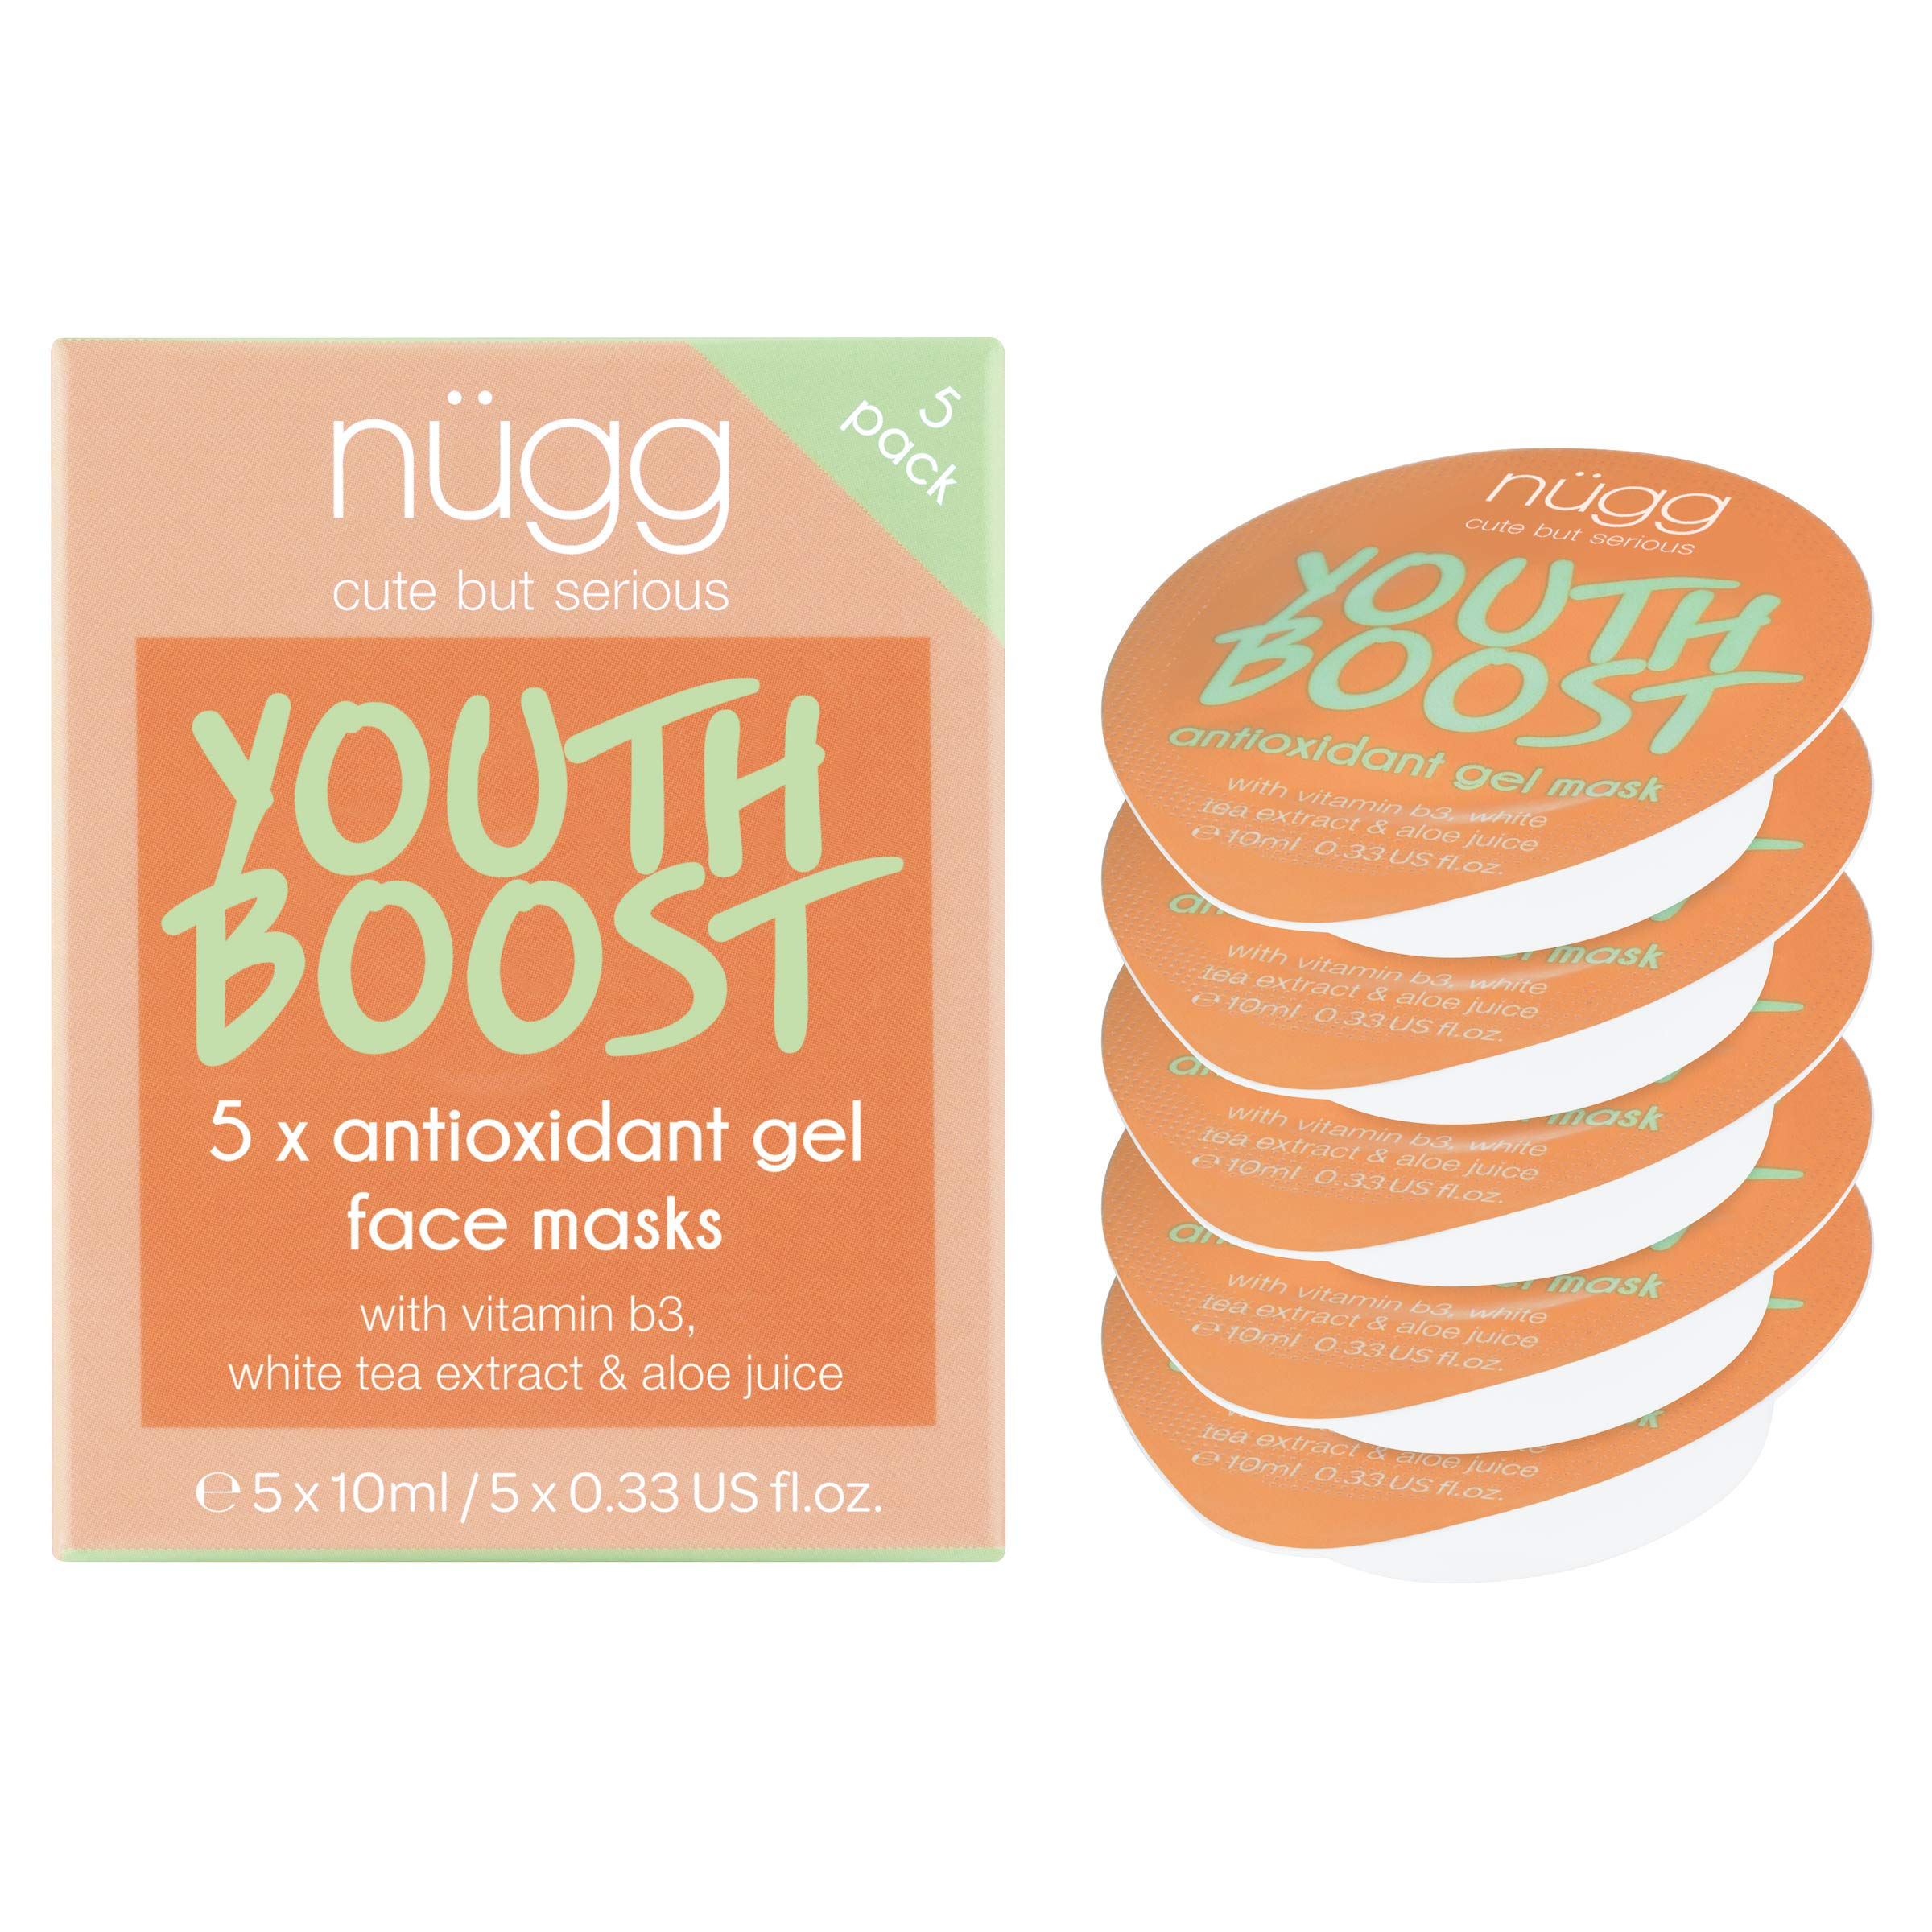 nügg Beauty Anti Aging Facial Skin Treatment - Vitamin B3 & White Tea Extract - 0.33 oz. each - 5 ct (1.65 oz total)